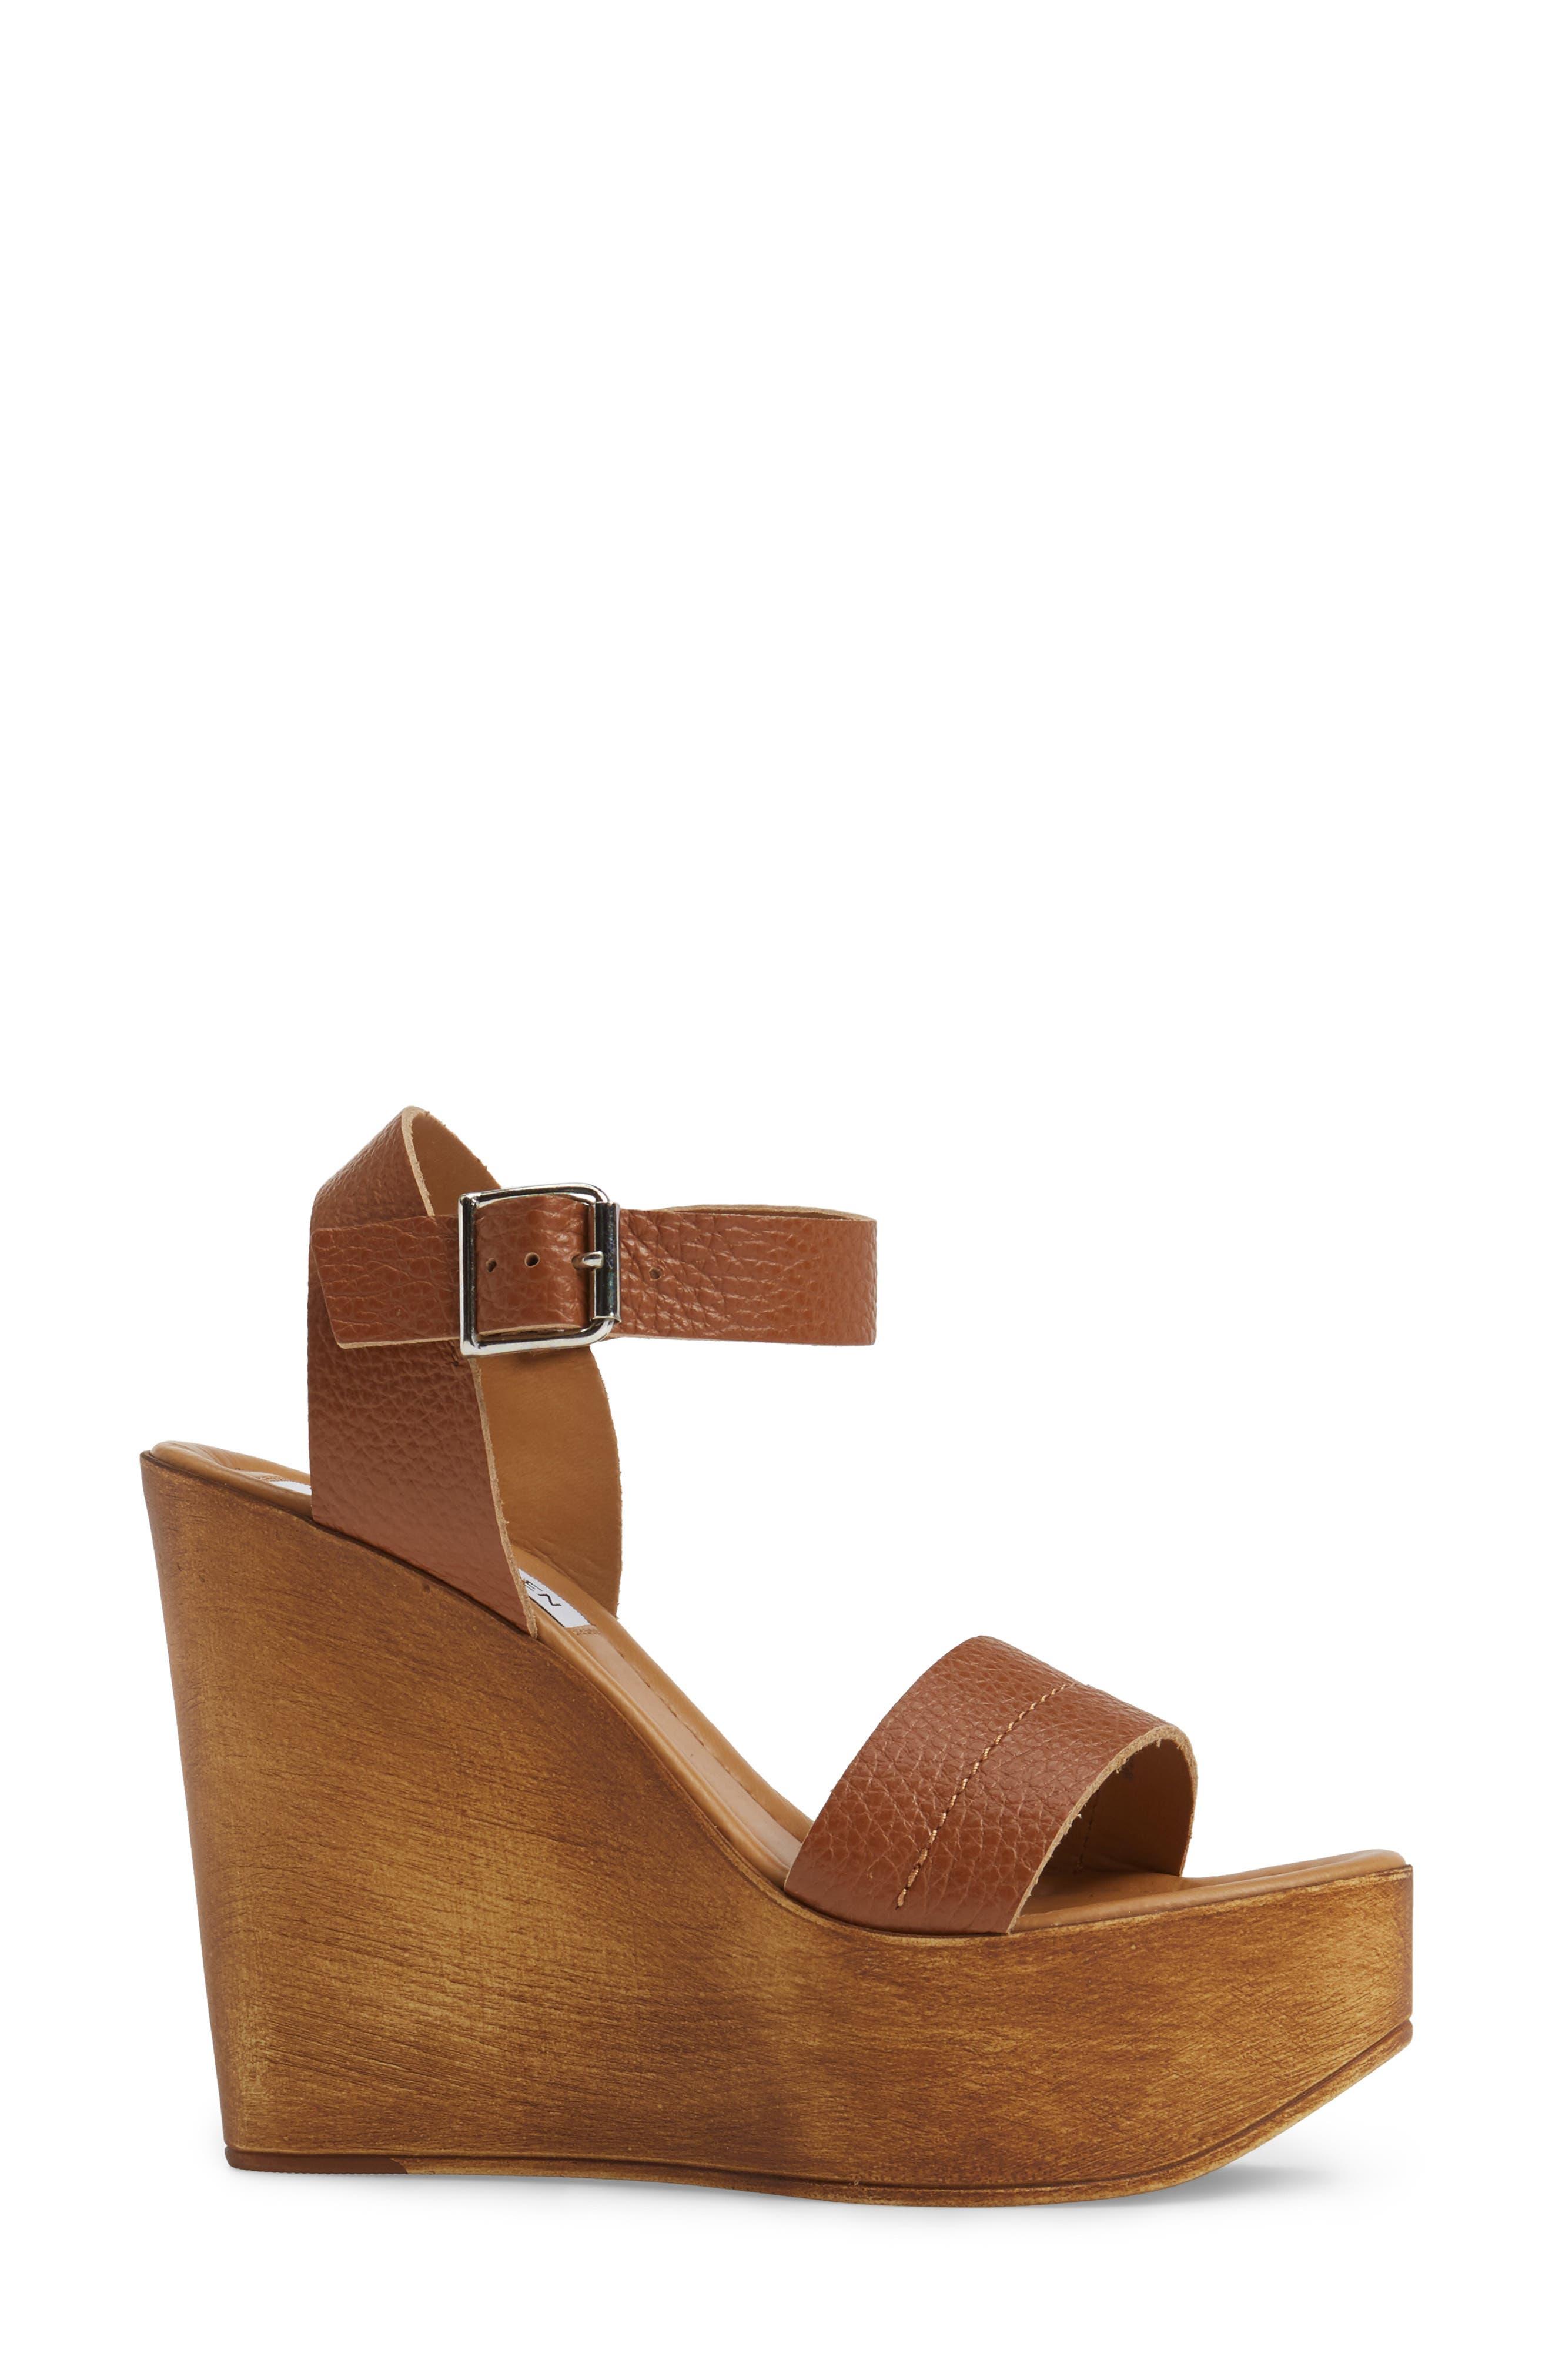 Belma Wedge Sandal,                             Alternate thumbnail 4, color,                             Tan Leather